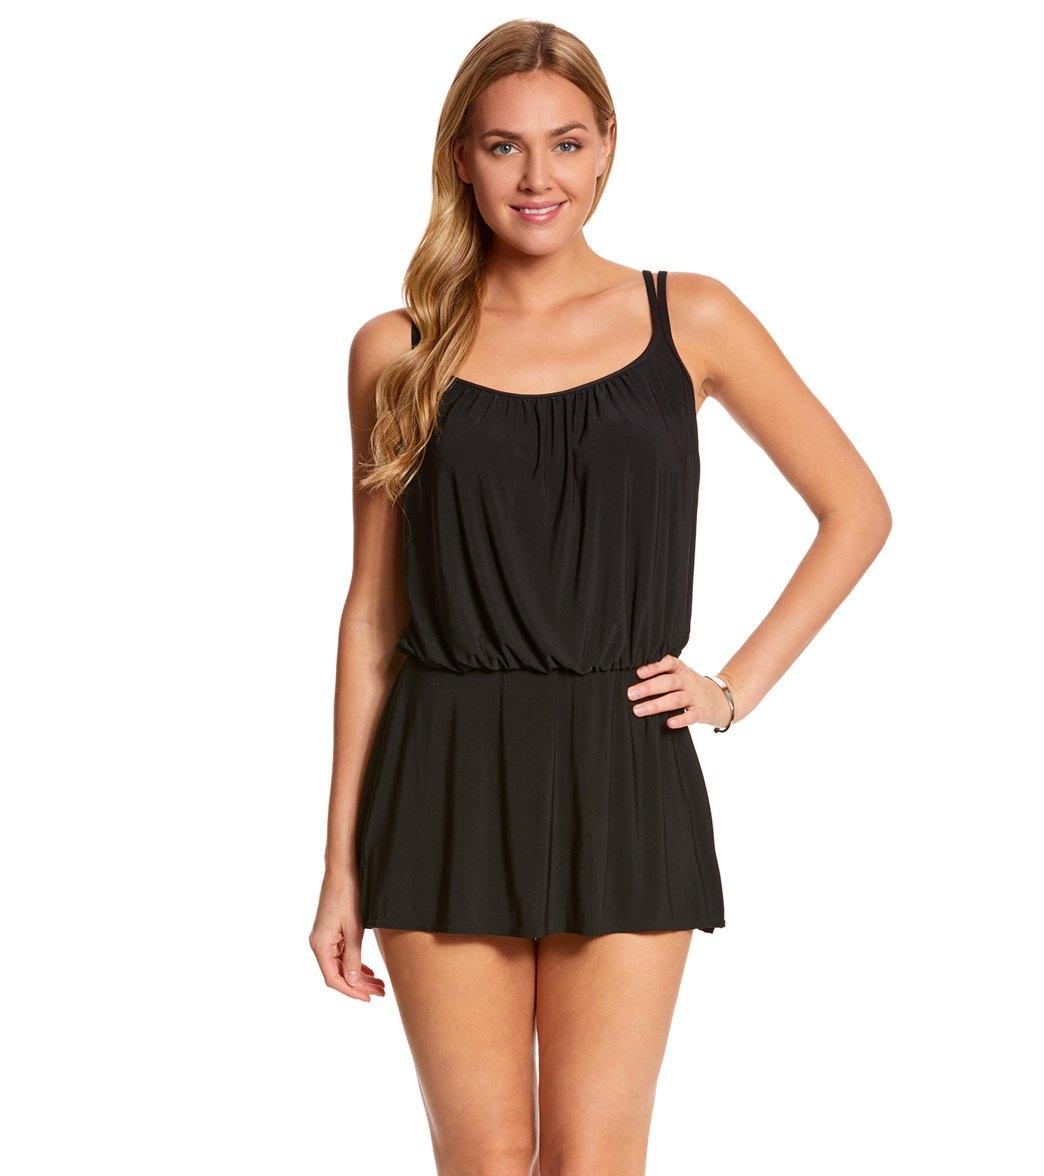 248b41127558d Longitude Shirring Chic Blouson Long Torso Swim Dress at SwimOutlet.com -  Free Shipping